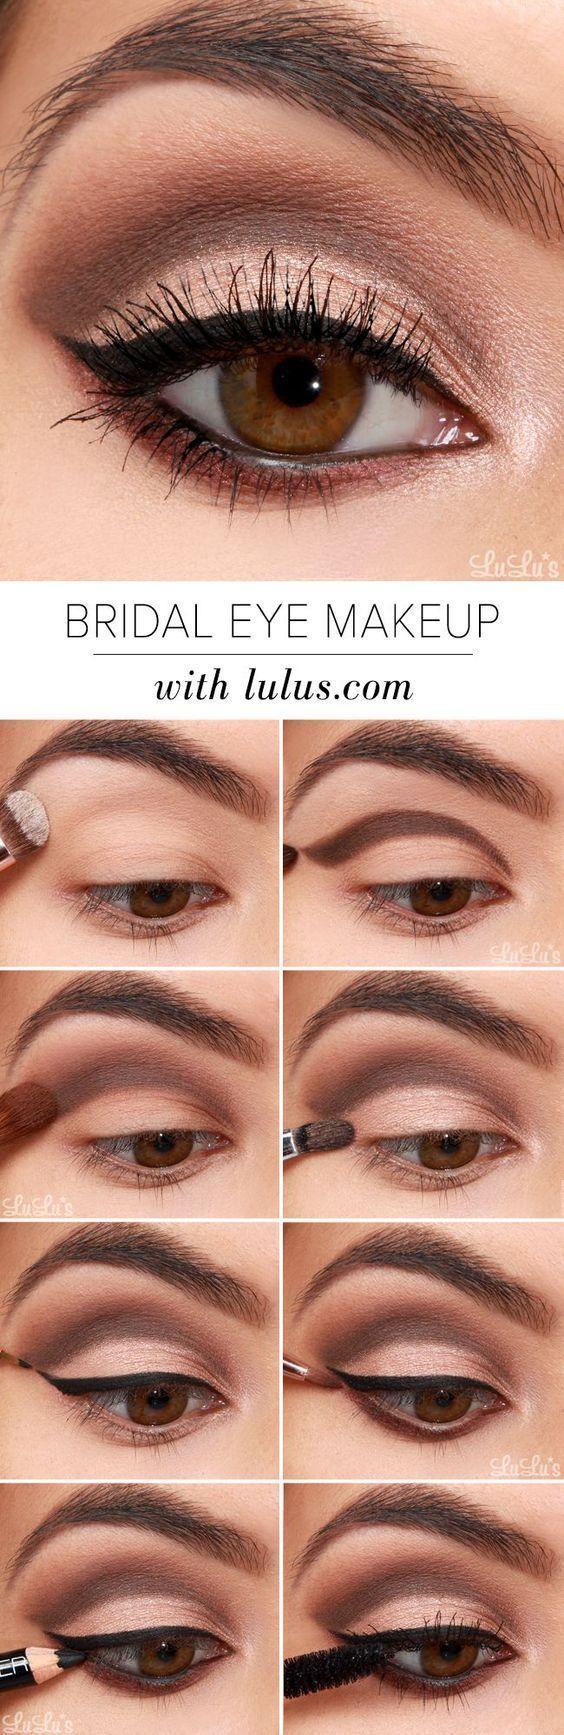 15 Easy Step By Bridal Eye Makeup Tutorials